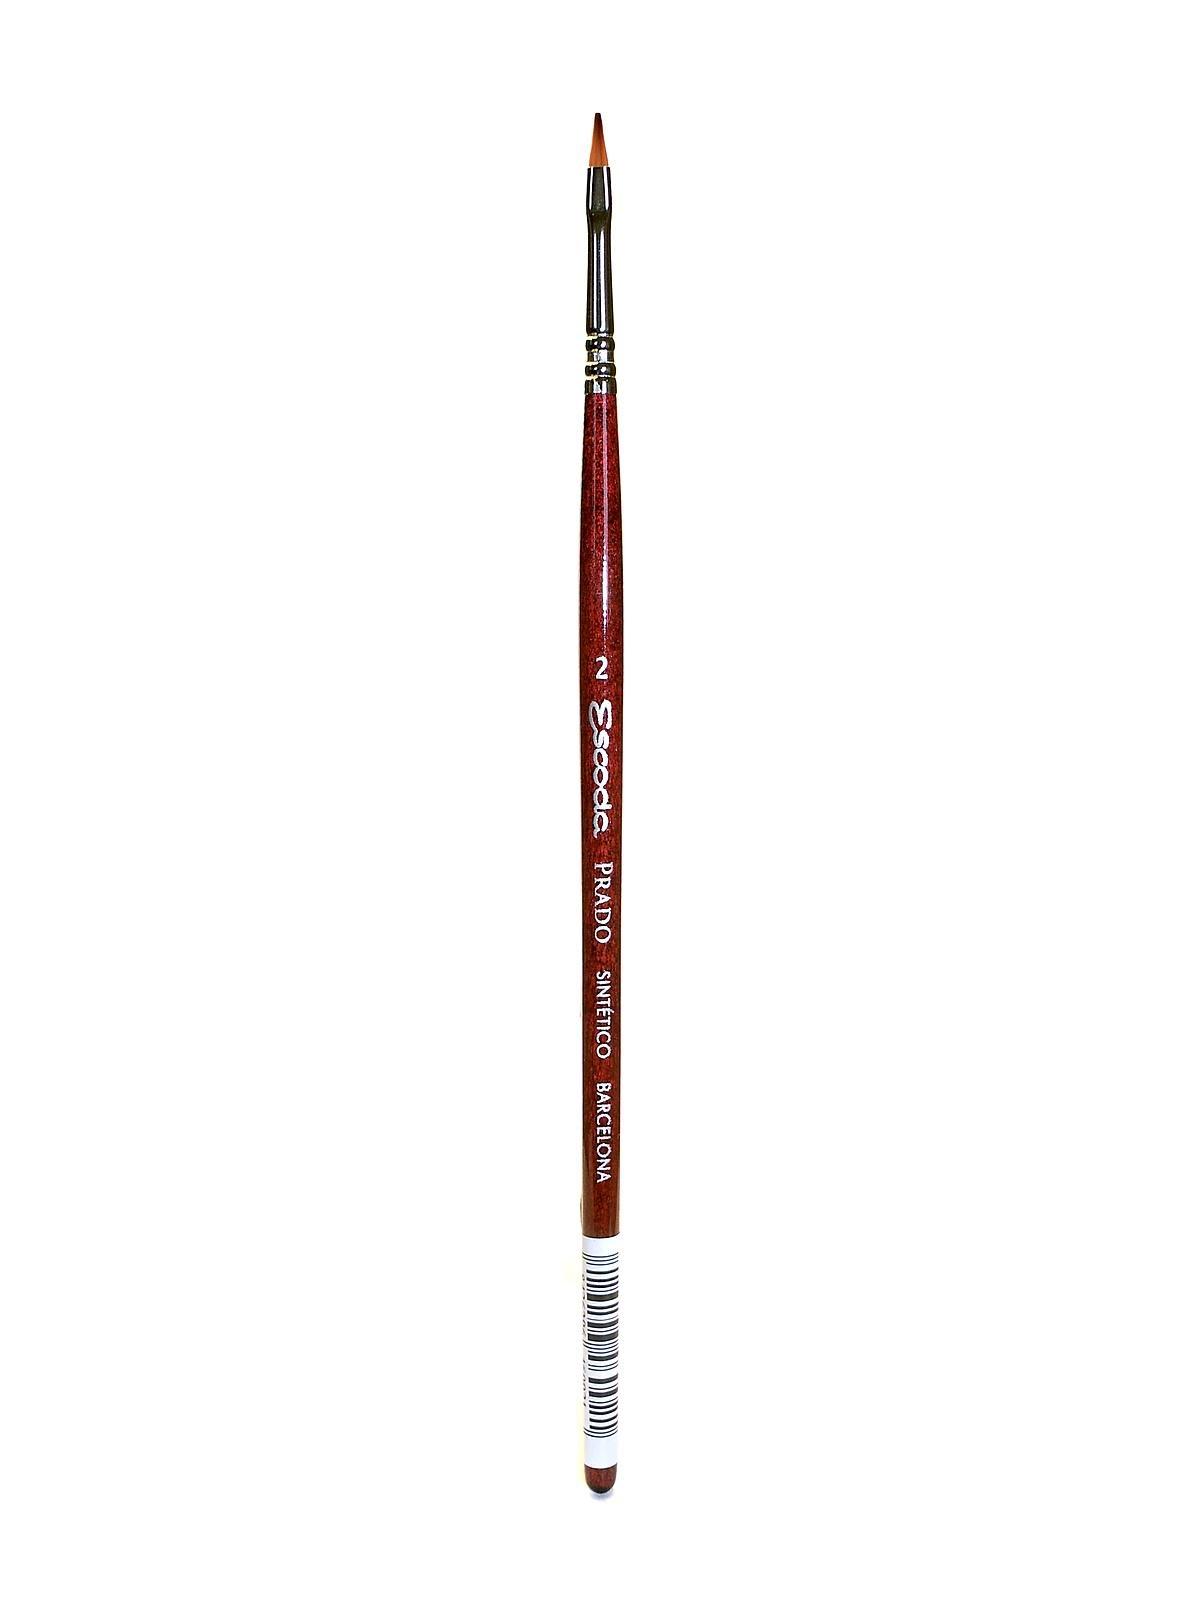 Global Art Escoda Prado Brushes bright 2 [PACK OF 2 ]